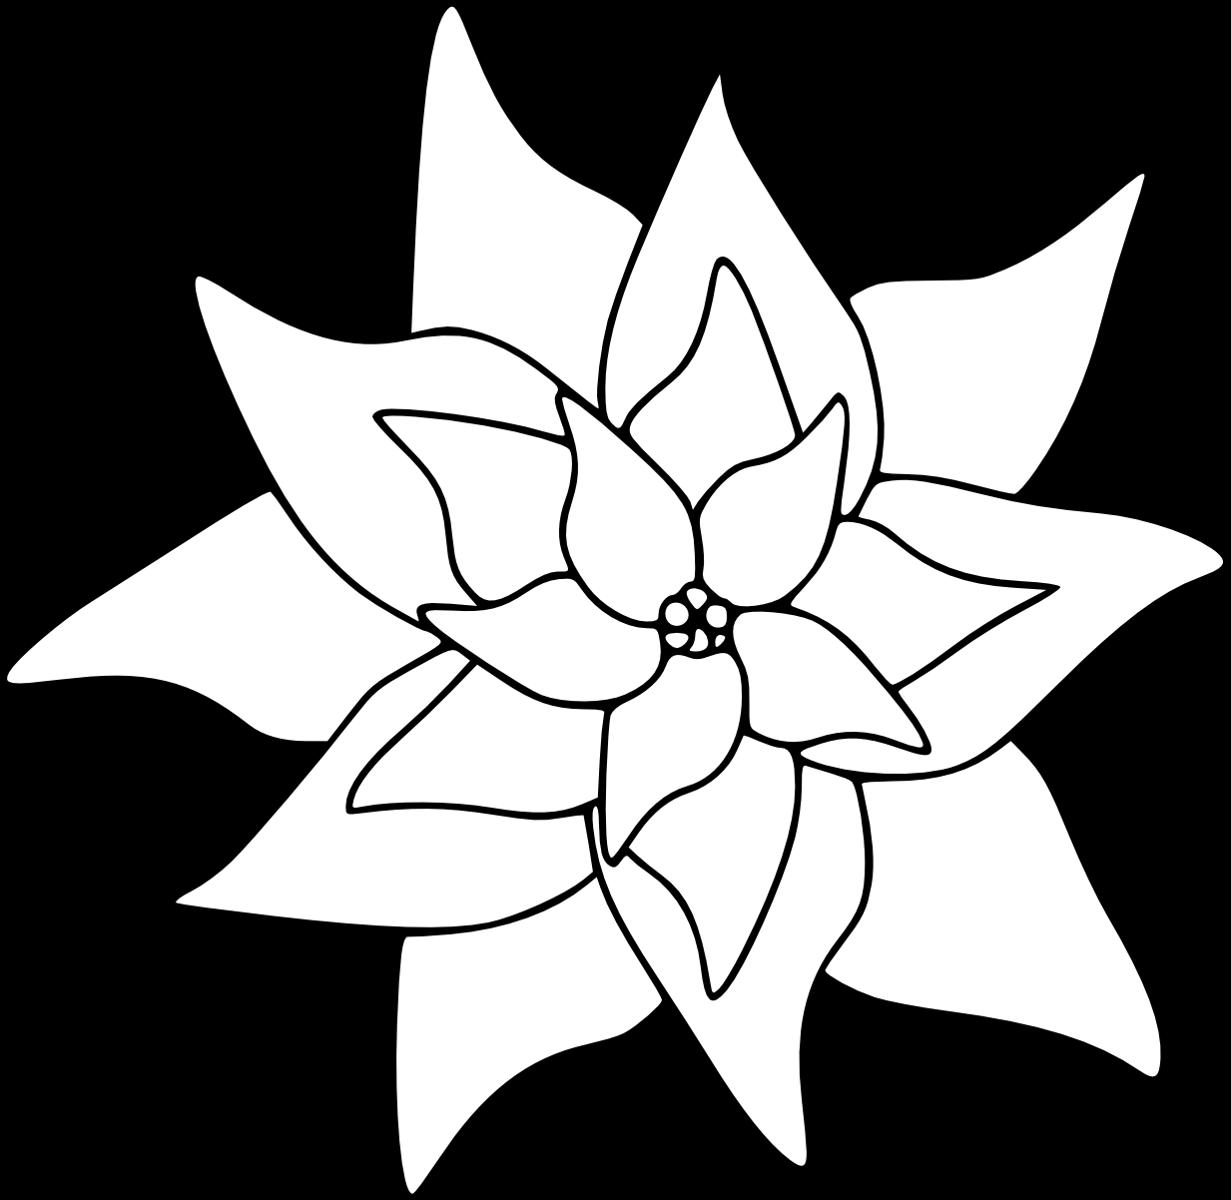 Www awaywiththepixels com pixels. Poinsettia clipart paper plate